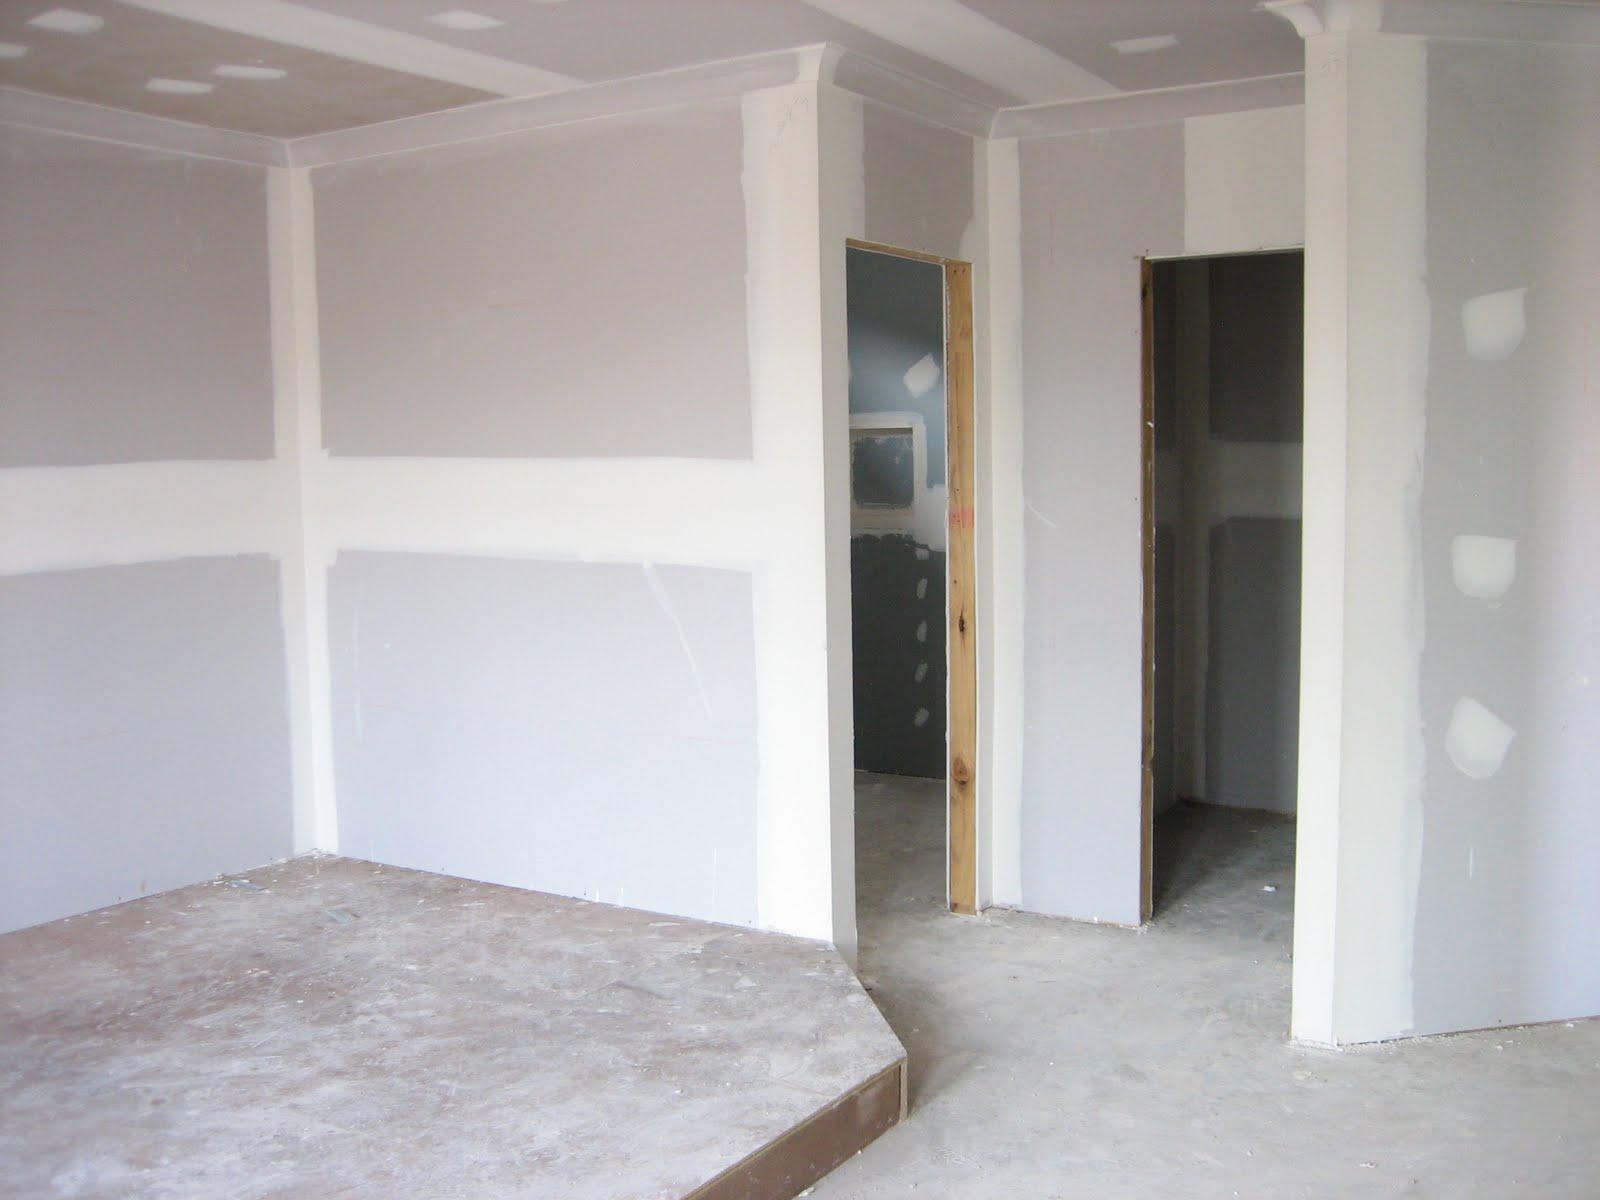 realizzazione-pareti-divisorie-rimini-santarcangelo-romagna